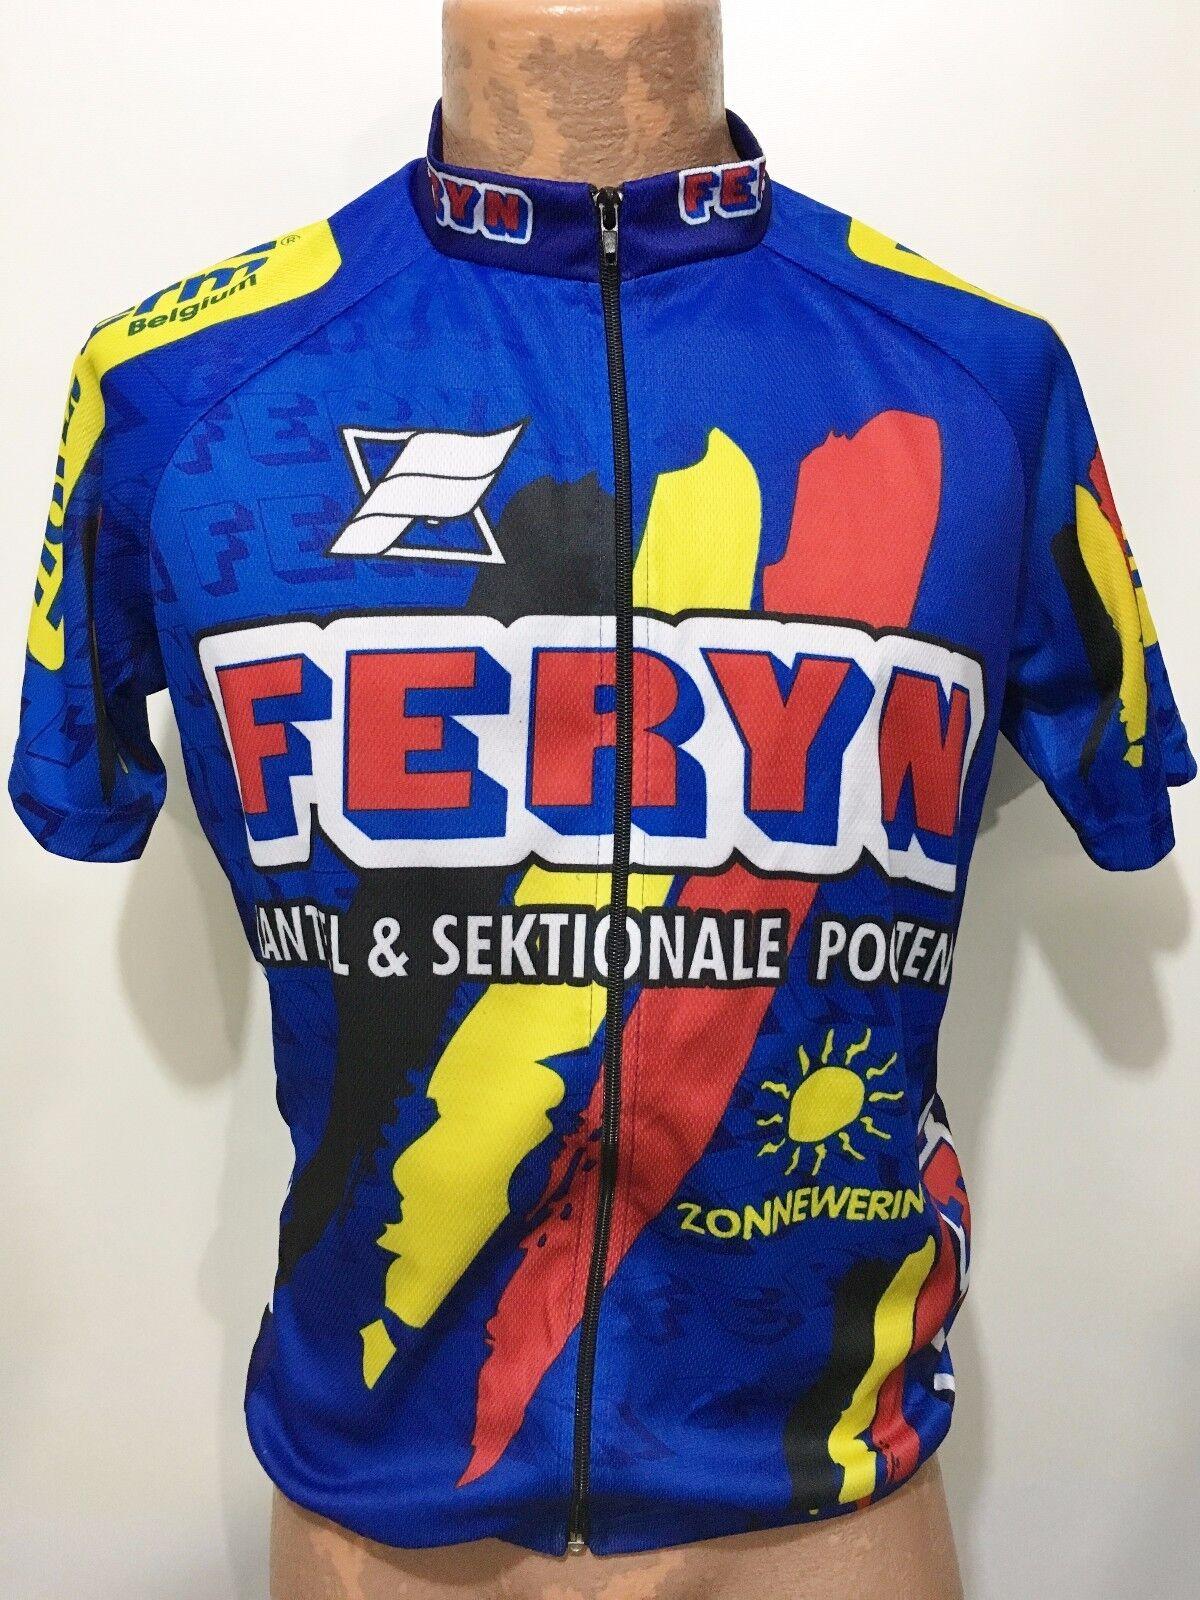 Feryn  Mens 5 L Full Zip Short Sleeve bluee Yellow Red Bike Jersey Belgium Cycling  buy cheap new